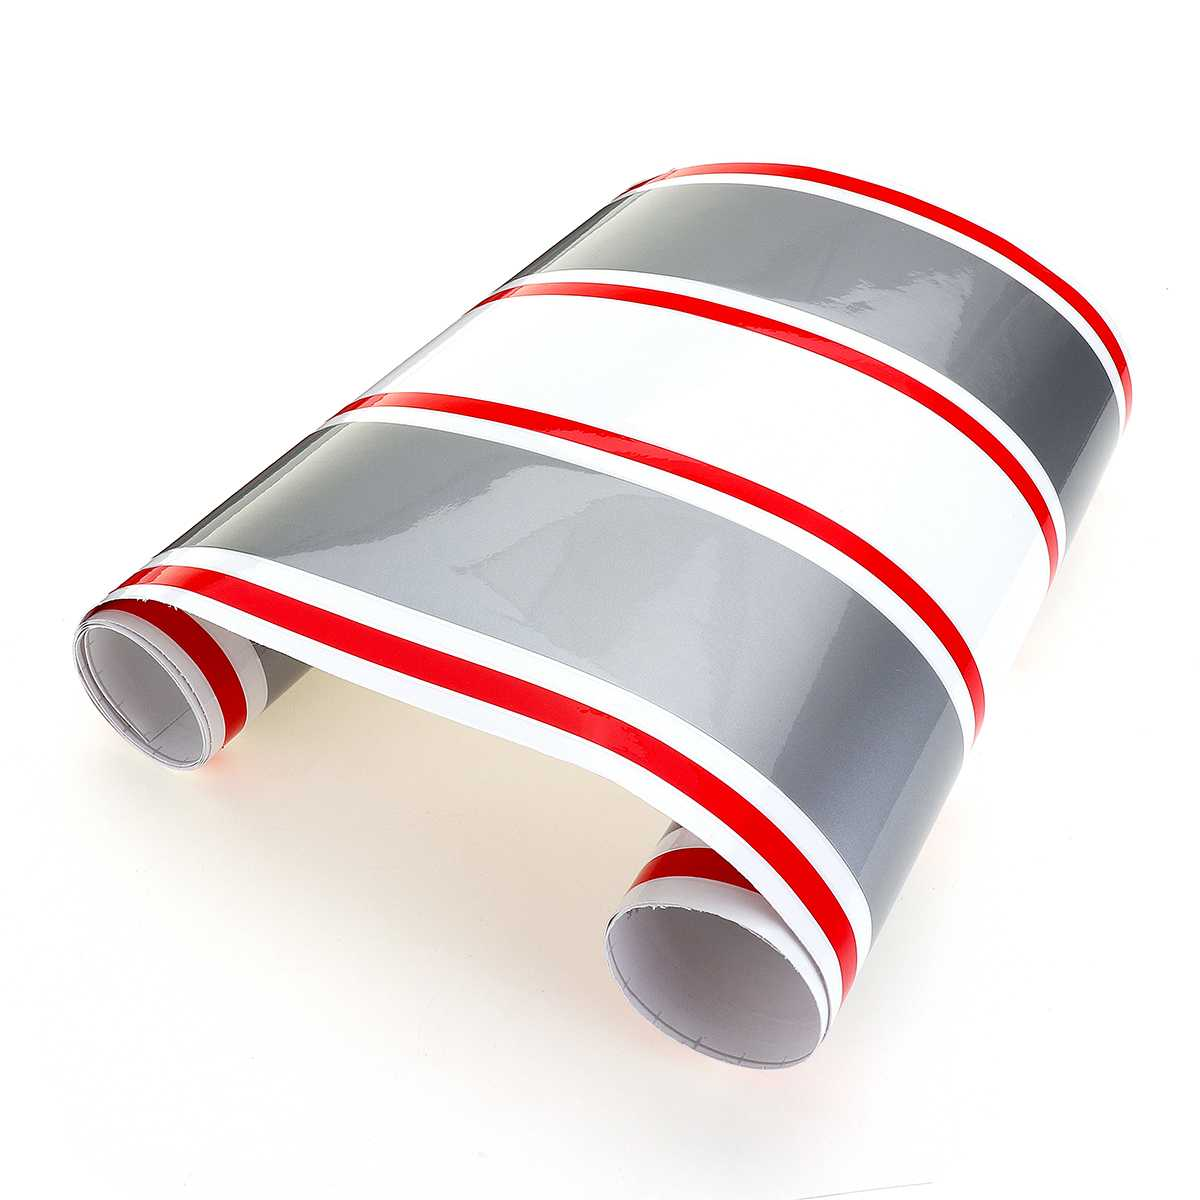 cheapest Engine Bonnet Hood Trunk Stripe Trim Sticker Line For Mini Cooper Bonnet Stripes R50 R52 R53 R55 R56 R57 For Mini Cooper S